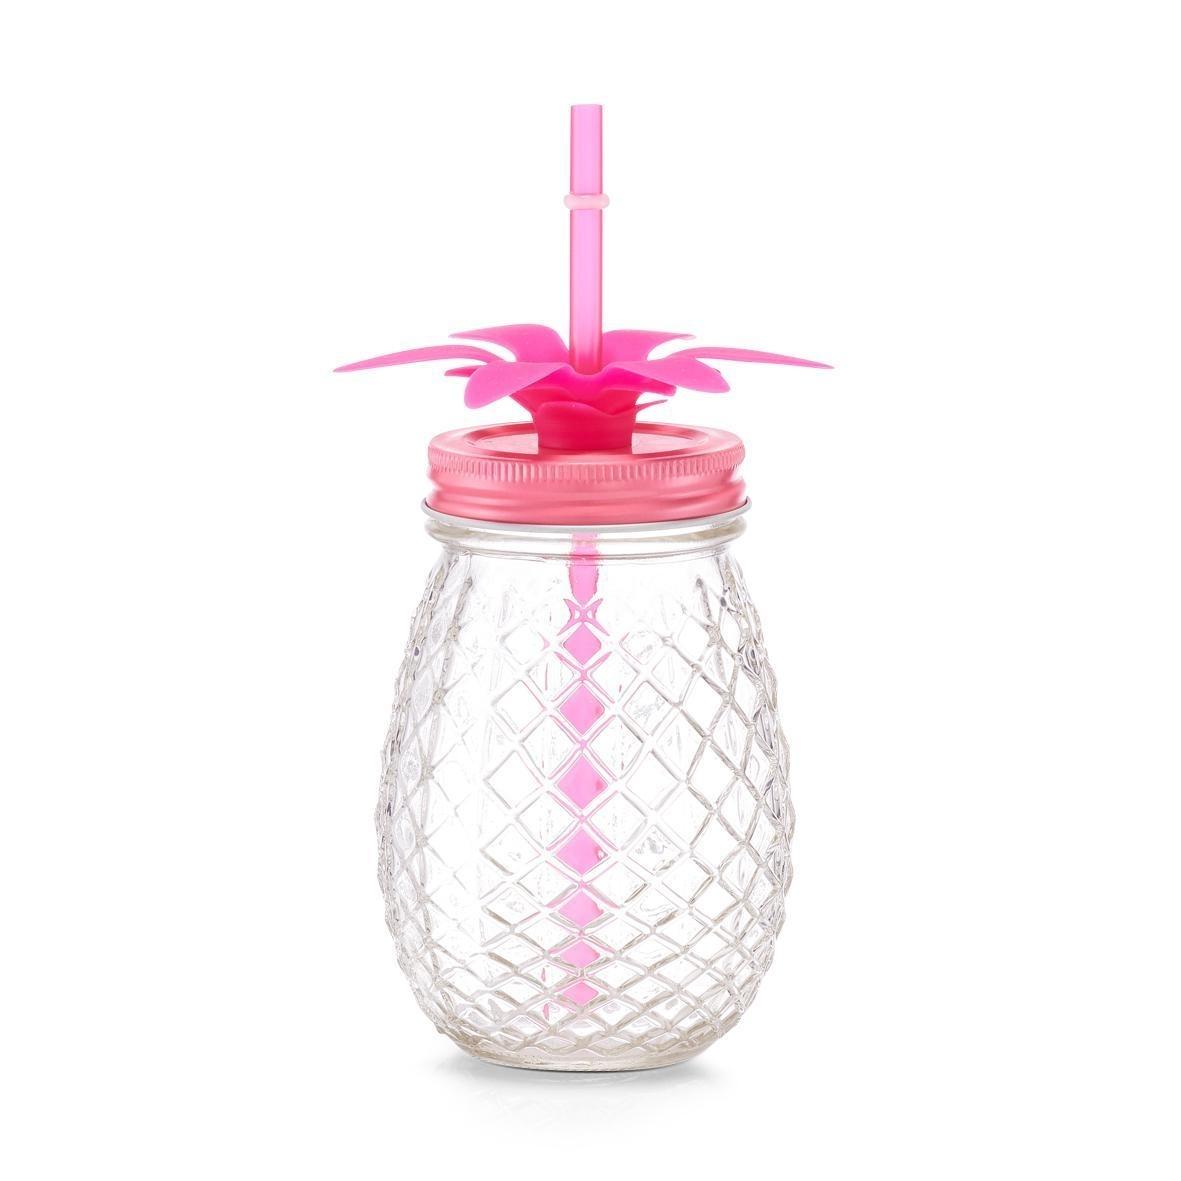 Pahar pentru limonada din sticla, capac si pai, Pineapple Roz, 500 ml, Ø9,5xH14,5 cm somproduct.ro